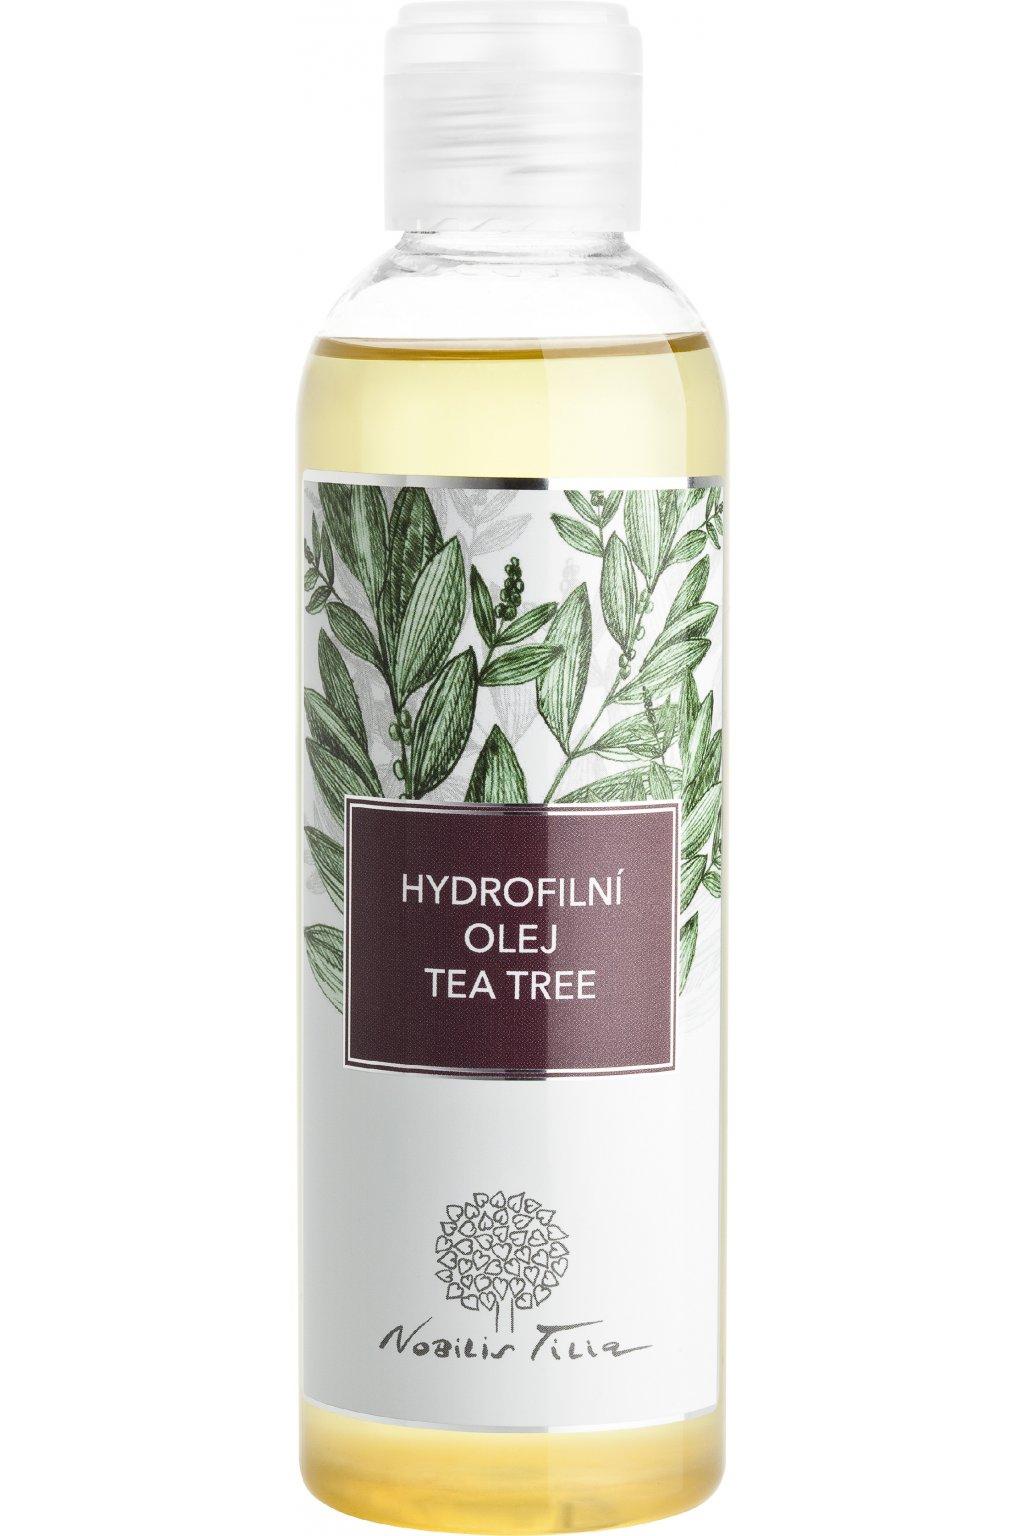 N0905I Hydrofilní olej s Tea tree 200 ml